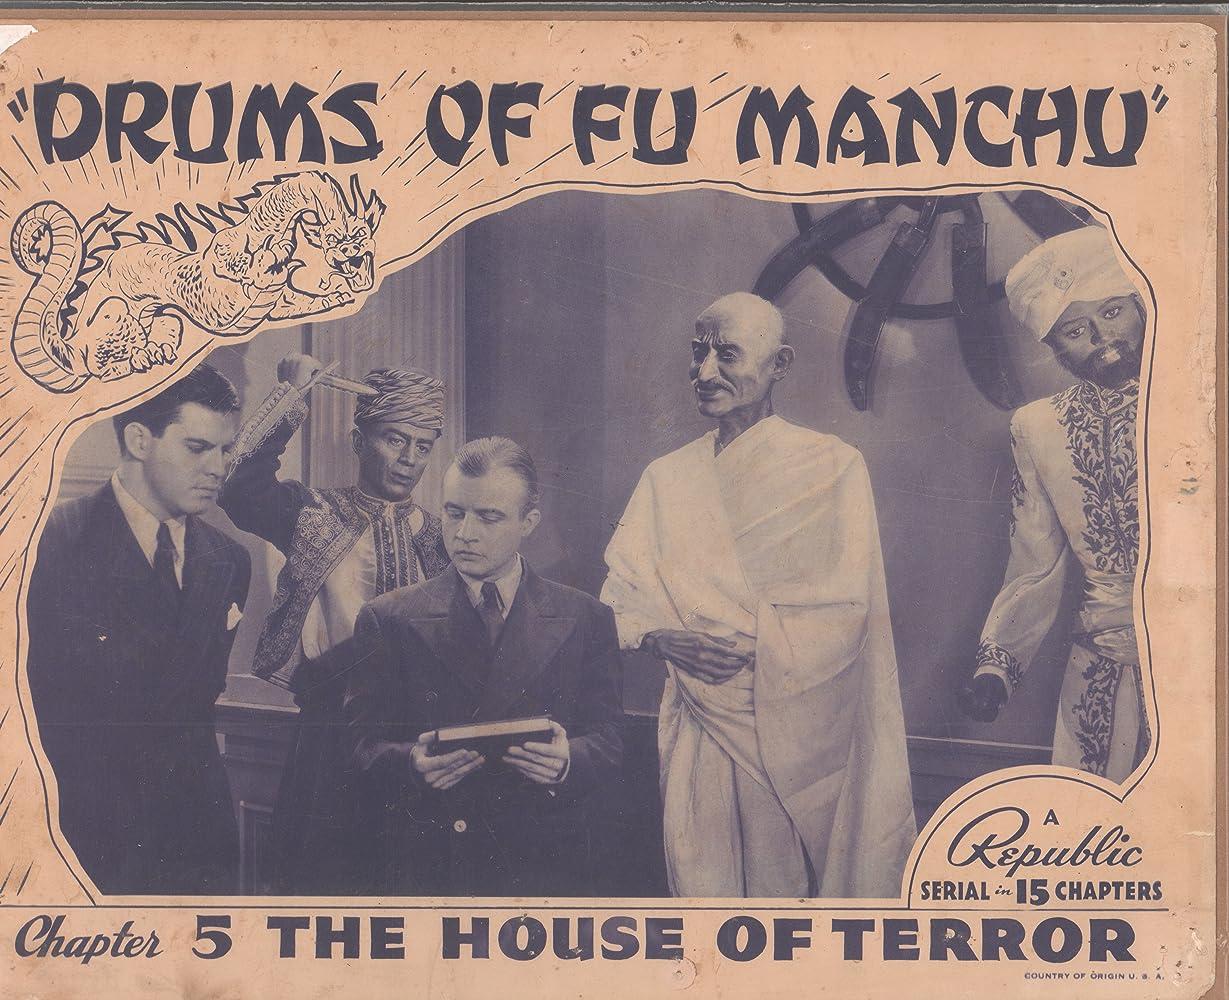 Dwight Frye and Robert Kellard in Drums of Fu Manchu (1940)